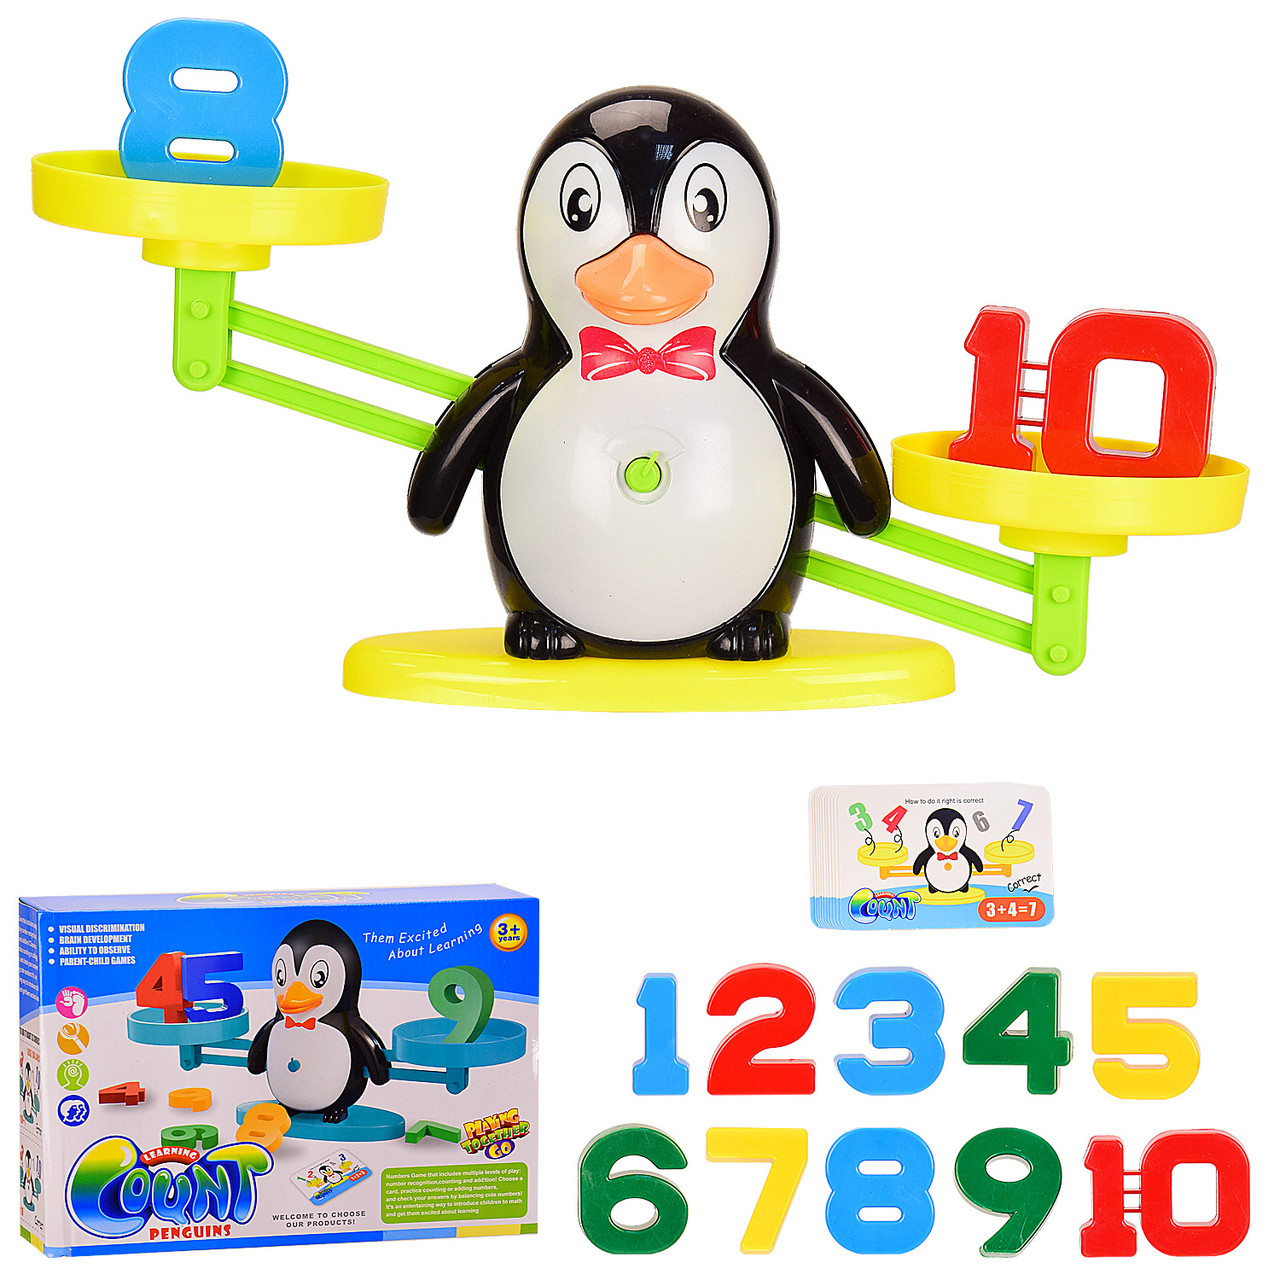 "Игра Learning Count ""Сохрани баланс"" Пингвин карточки с заданиями,  в коробке ZG987"